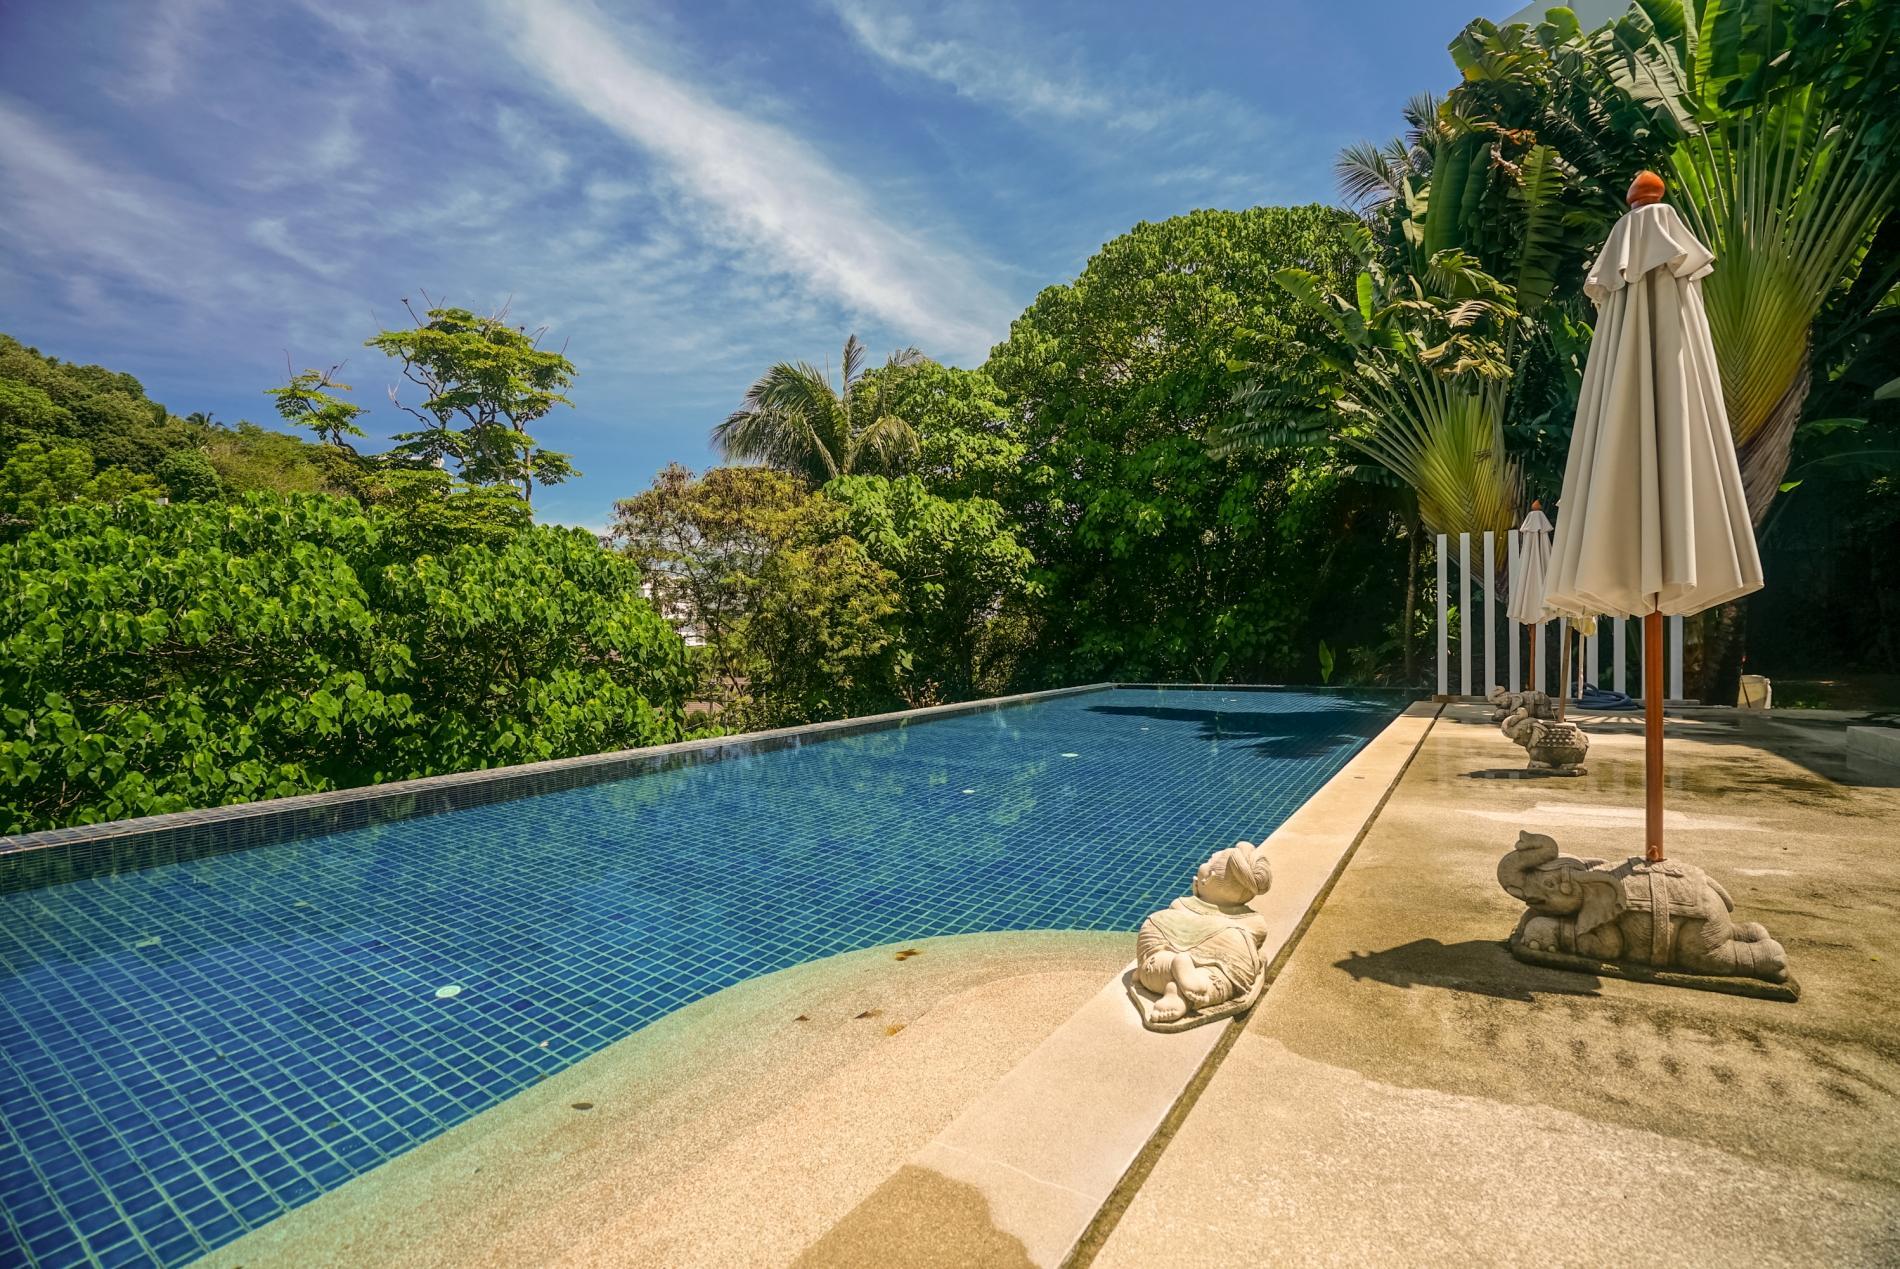 Apartment KH2605 - Sea-view Penthouse in Karon  walk to beach  restaurants  bars  shops photo 20257337